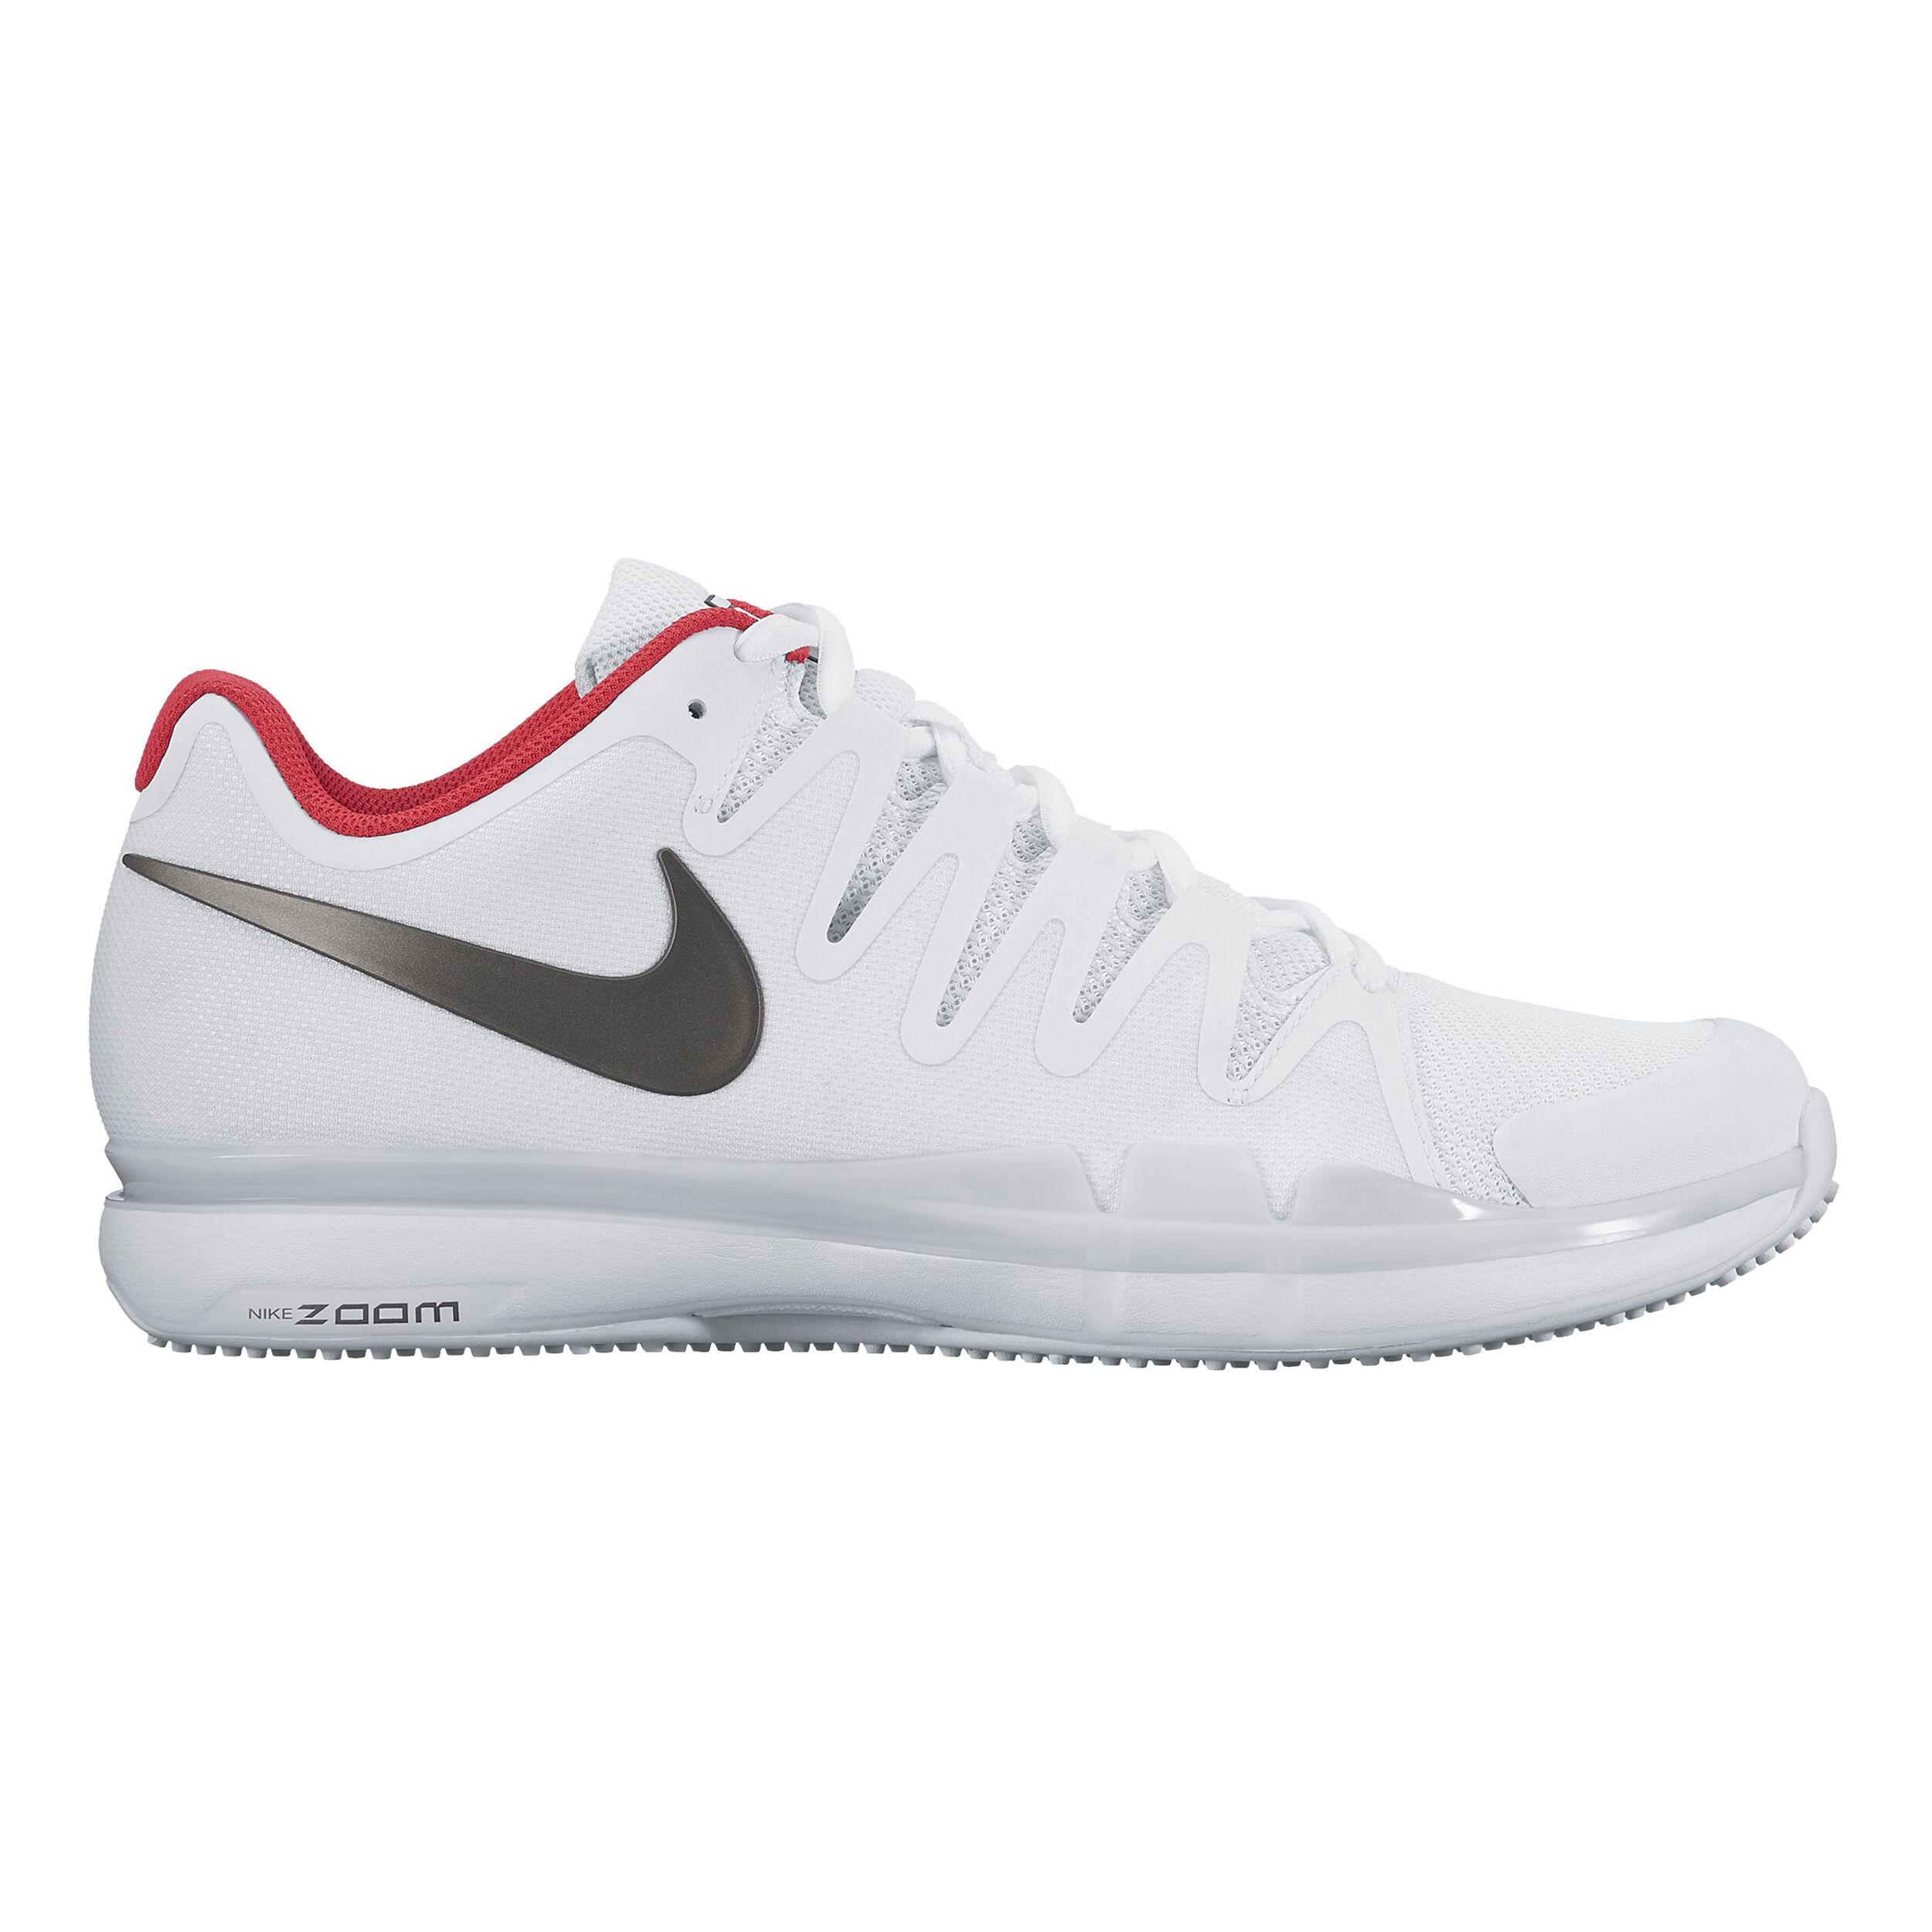 nike zoom vapor 9.5 tour grass court shoe men